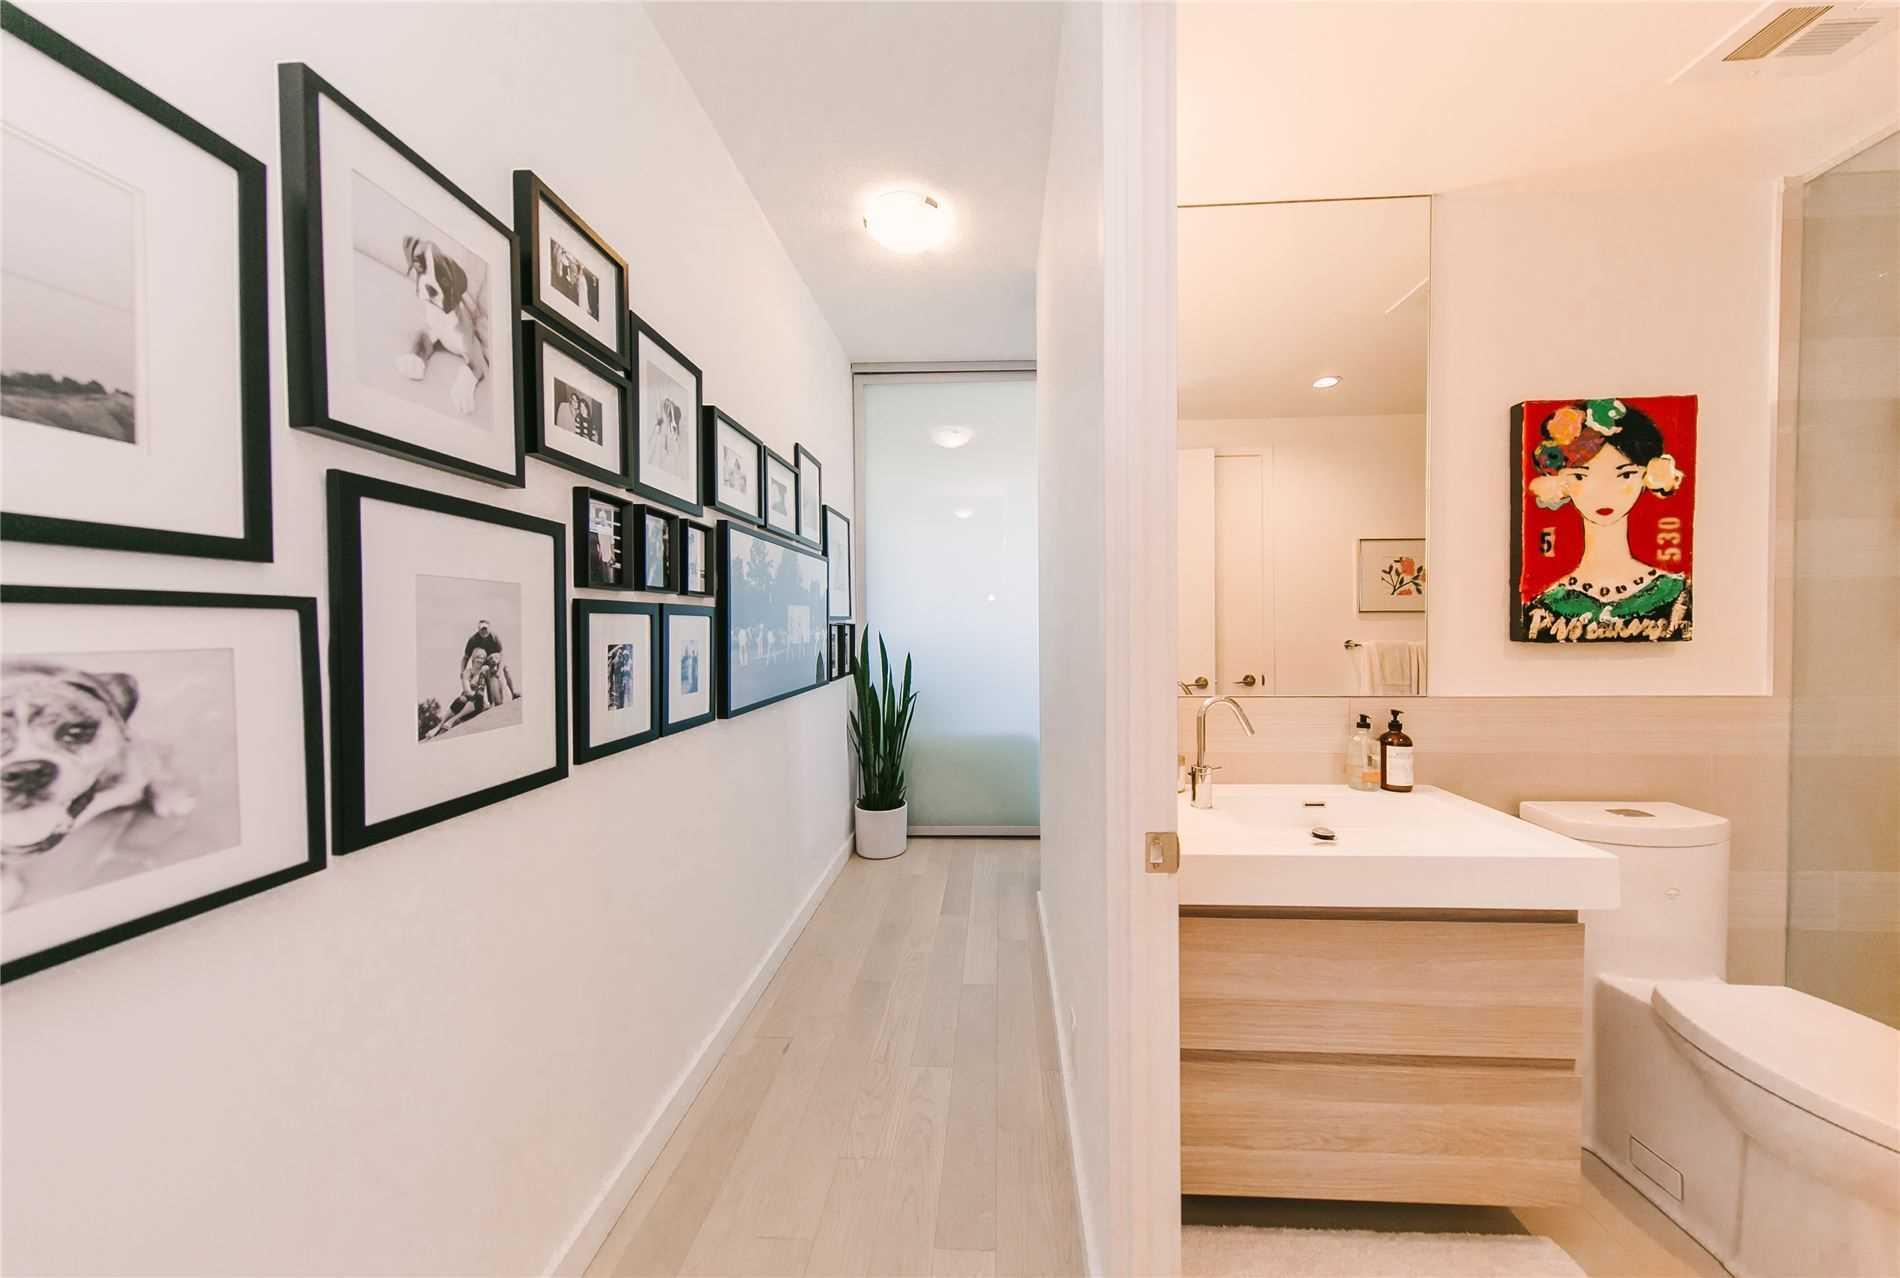 Condo Apt For Sale In Toronto , 2 Bedrooms Bedrooms, ,2 BathroomsBathrooms,Condo Apt,For Sale,1407,Cherry